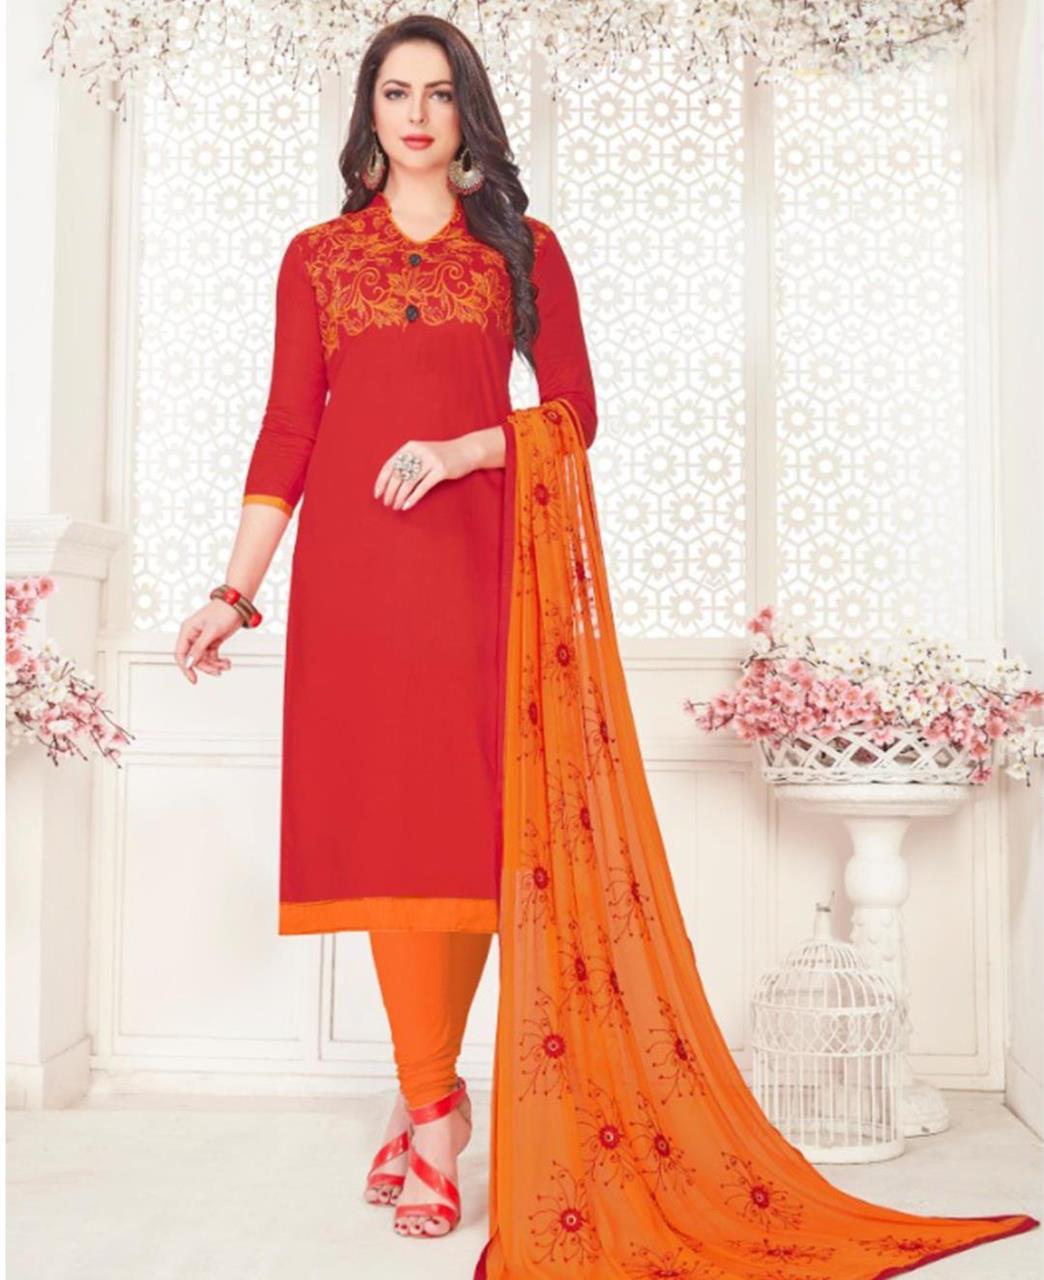 Embroidered Cotton Satin Red Straight Cut Salwar Kameez